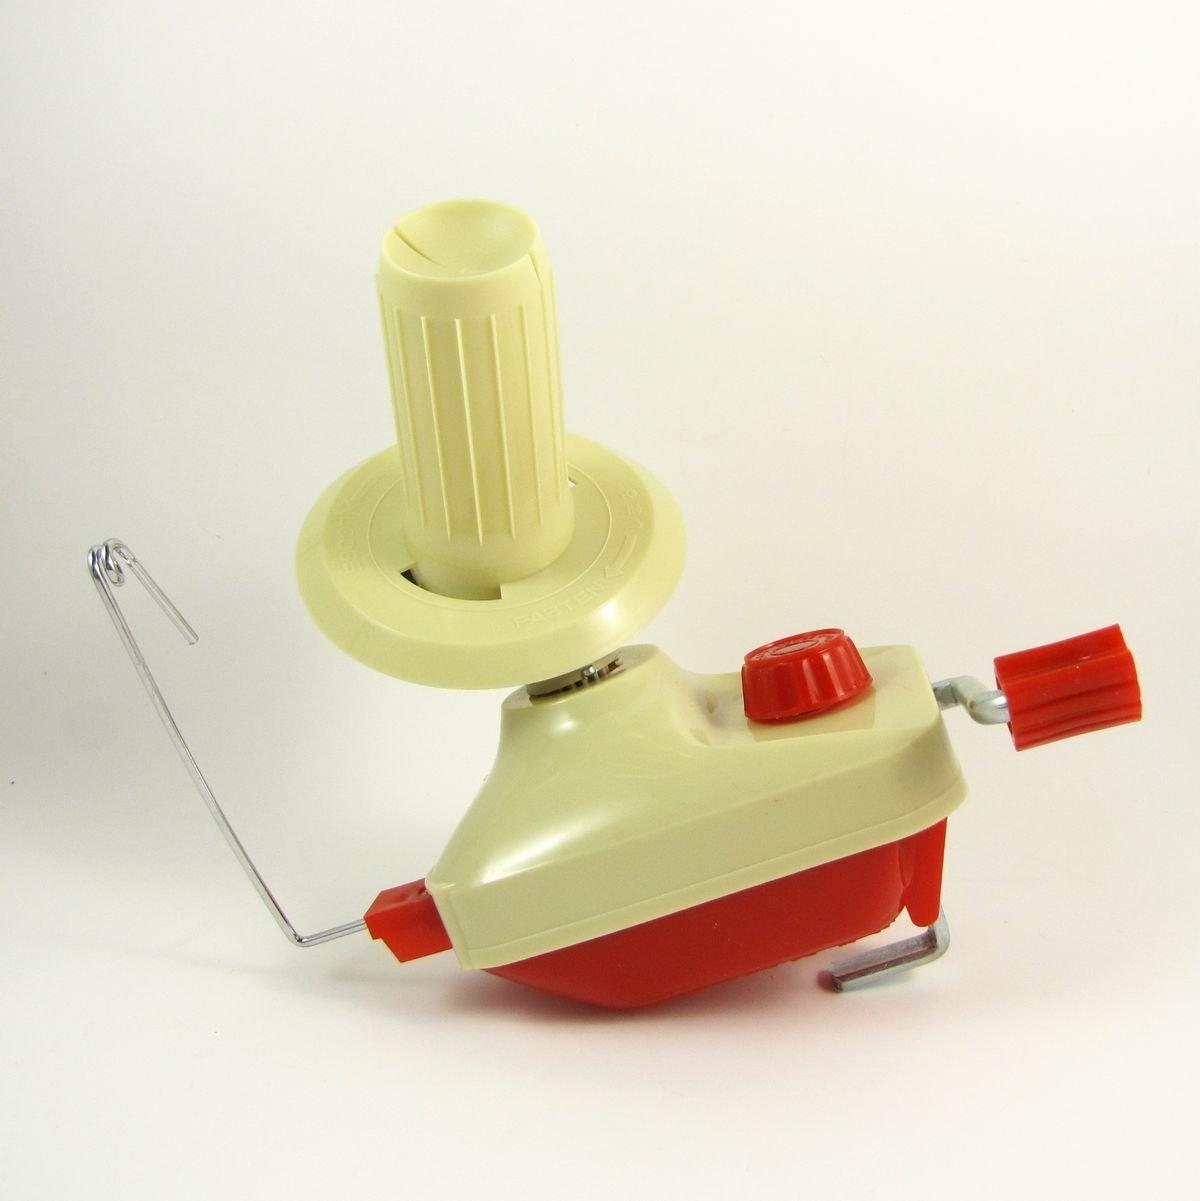 Portable Yarn Fiber String Ball Wool Winder Hand Operated Holder